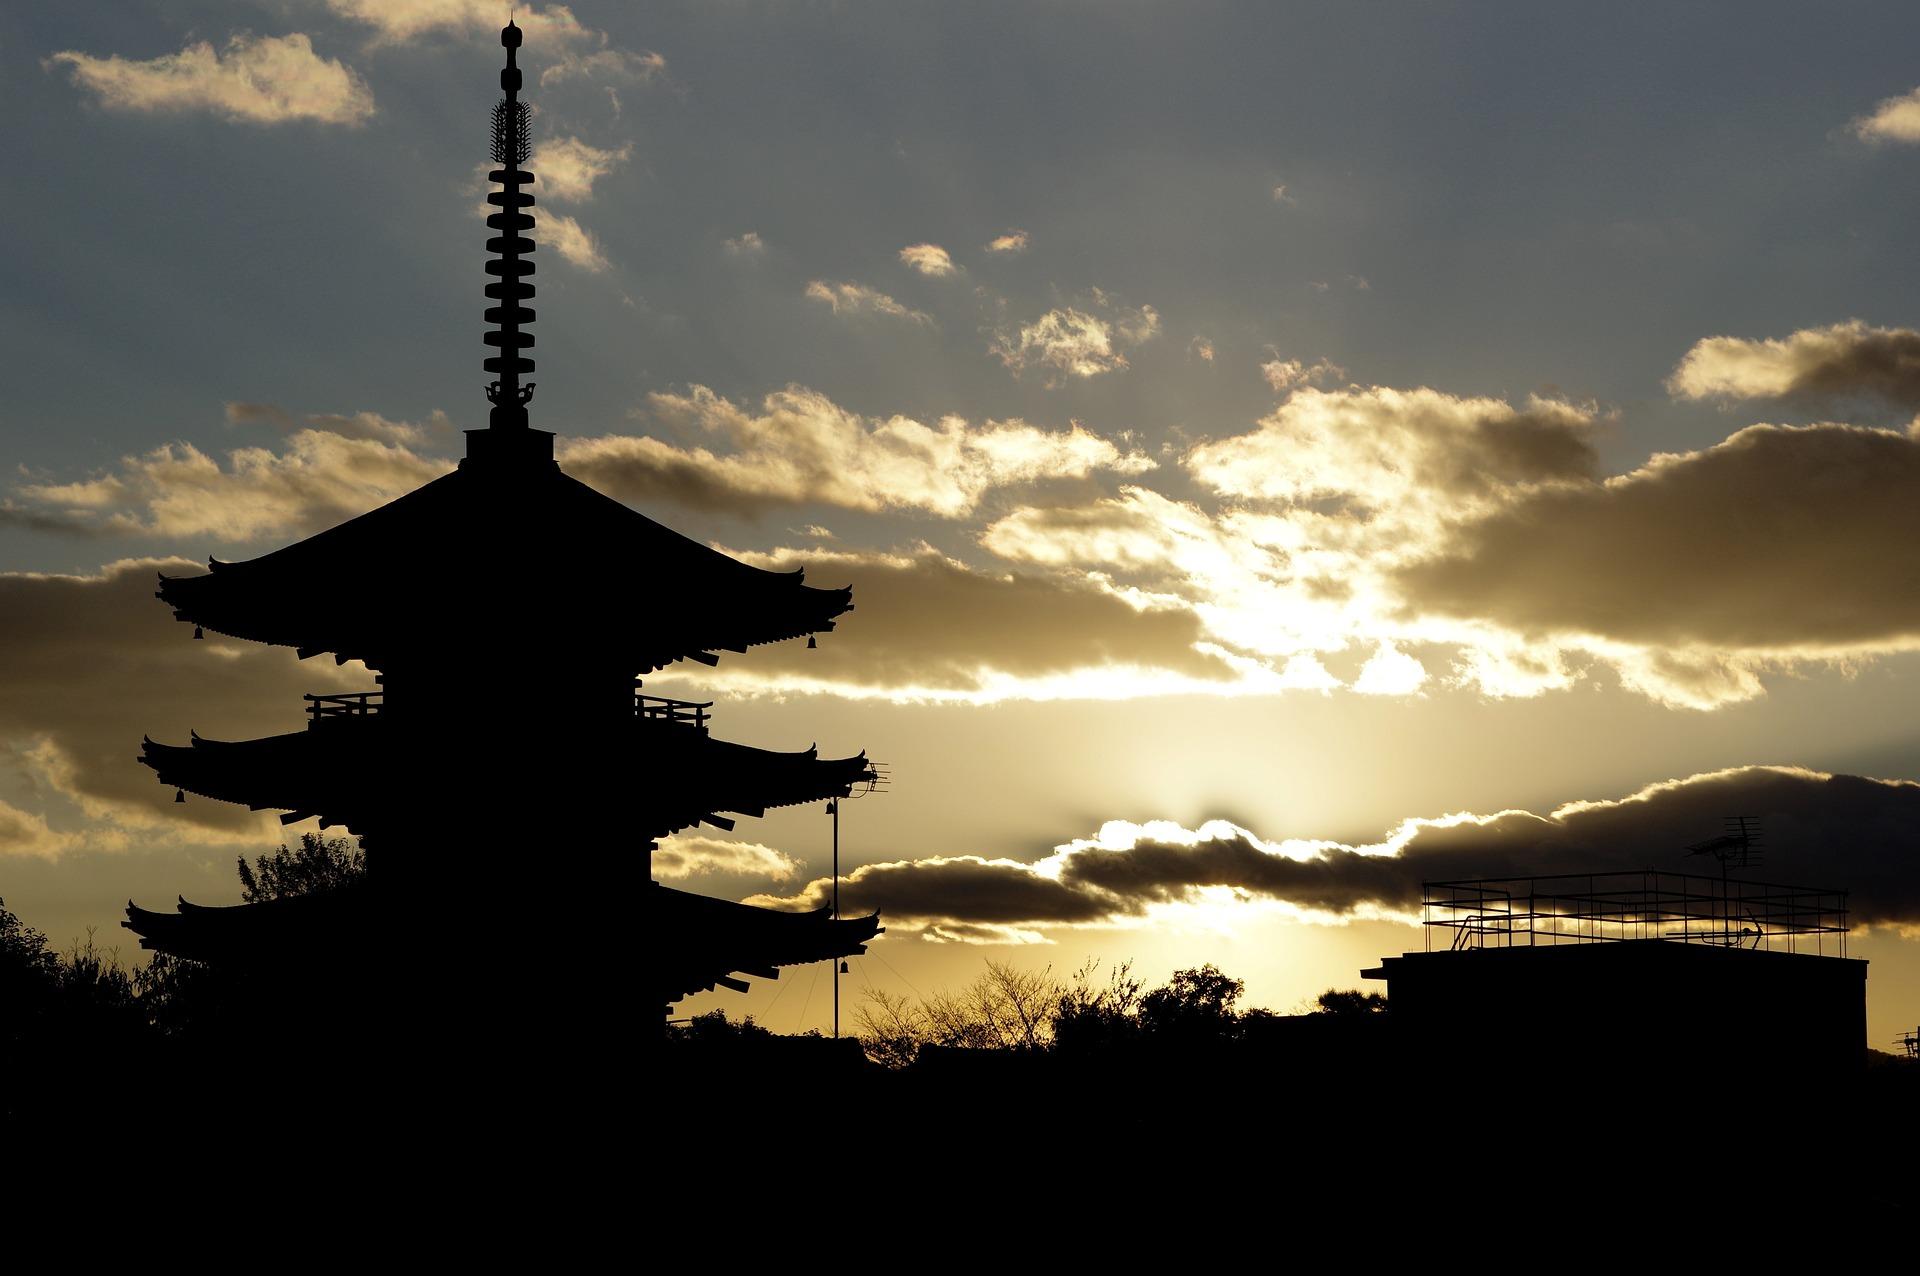 kyoto-1199231_1920.jpg